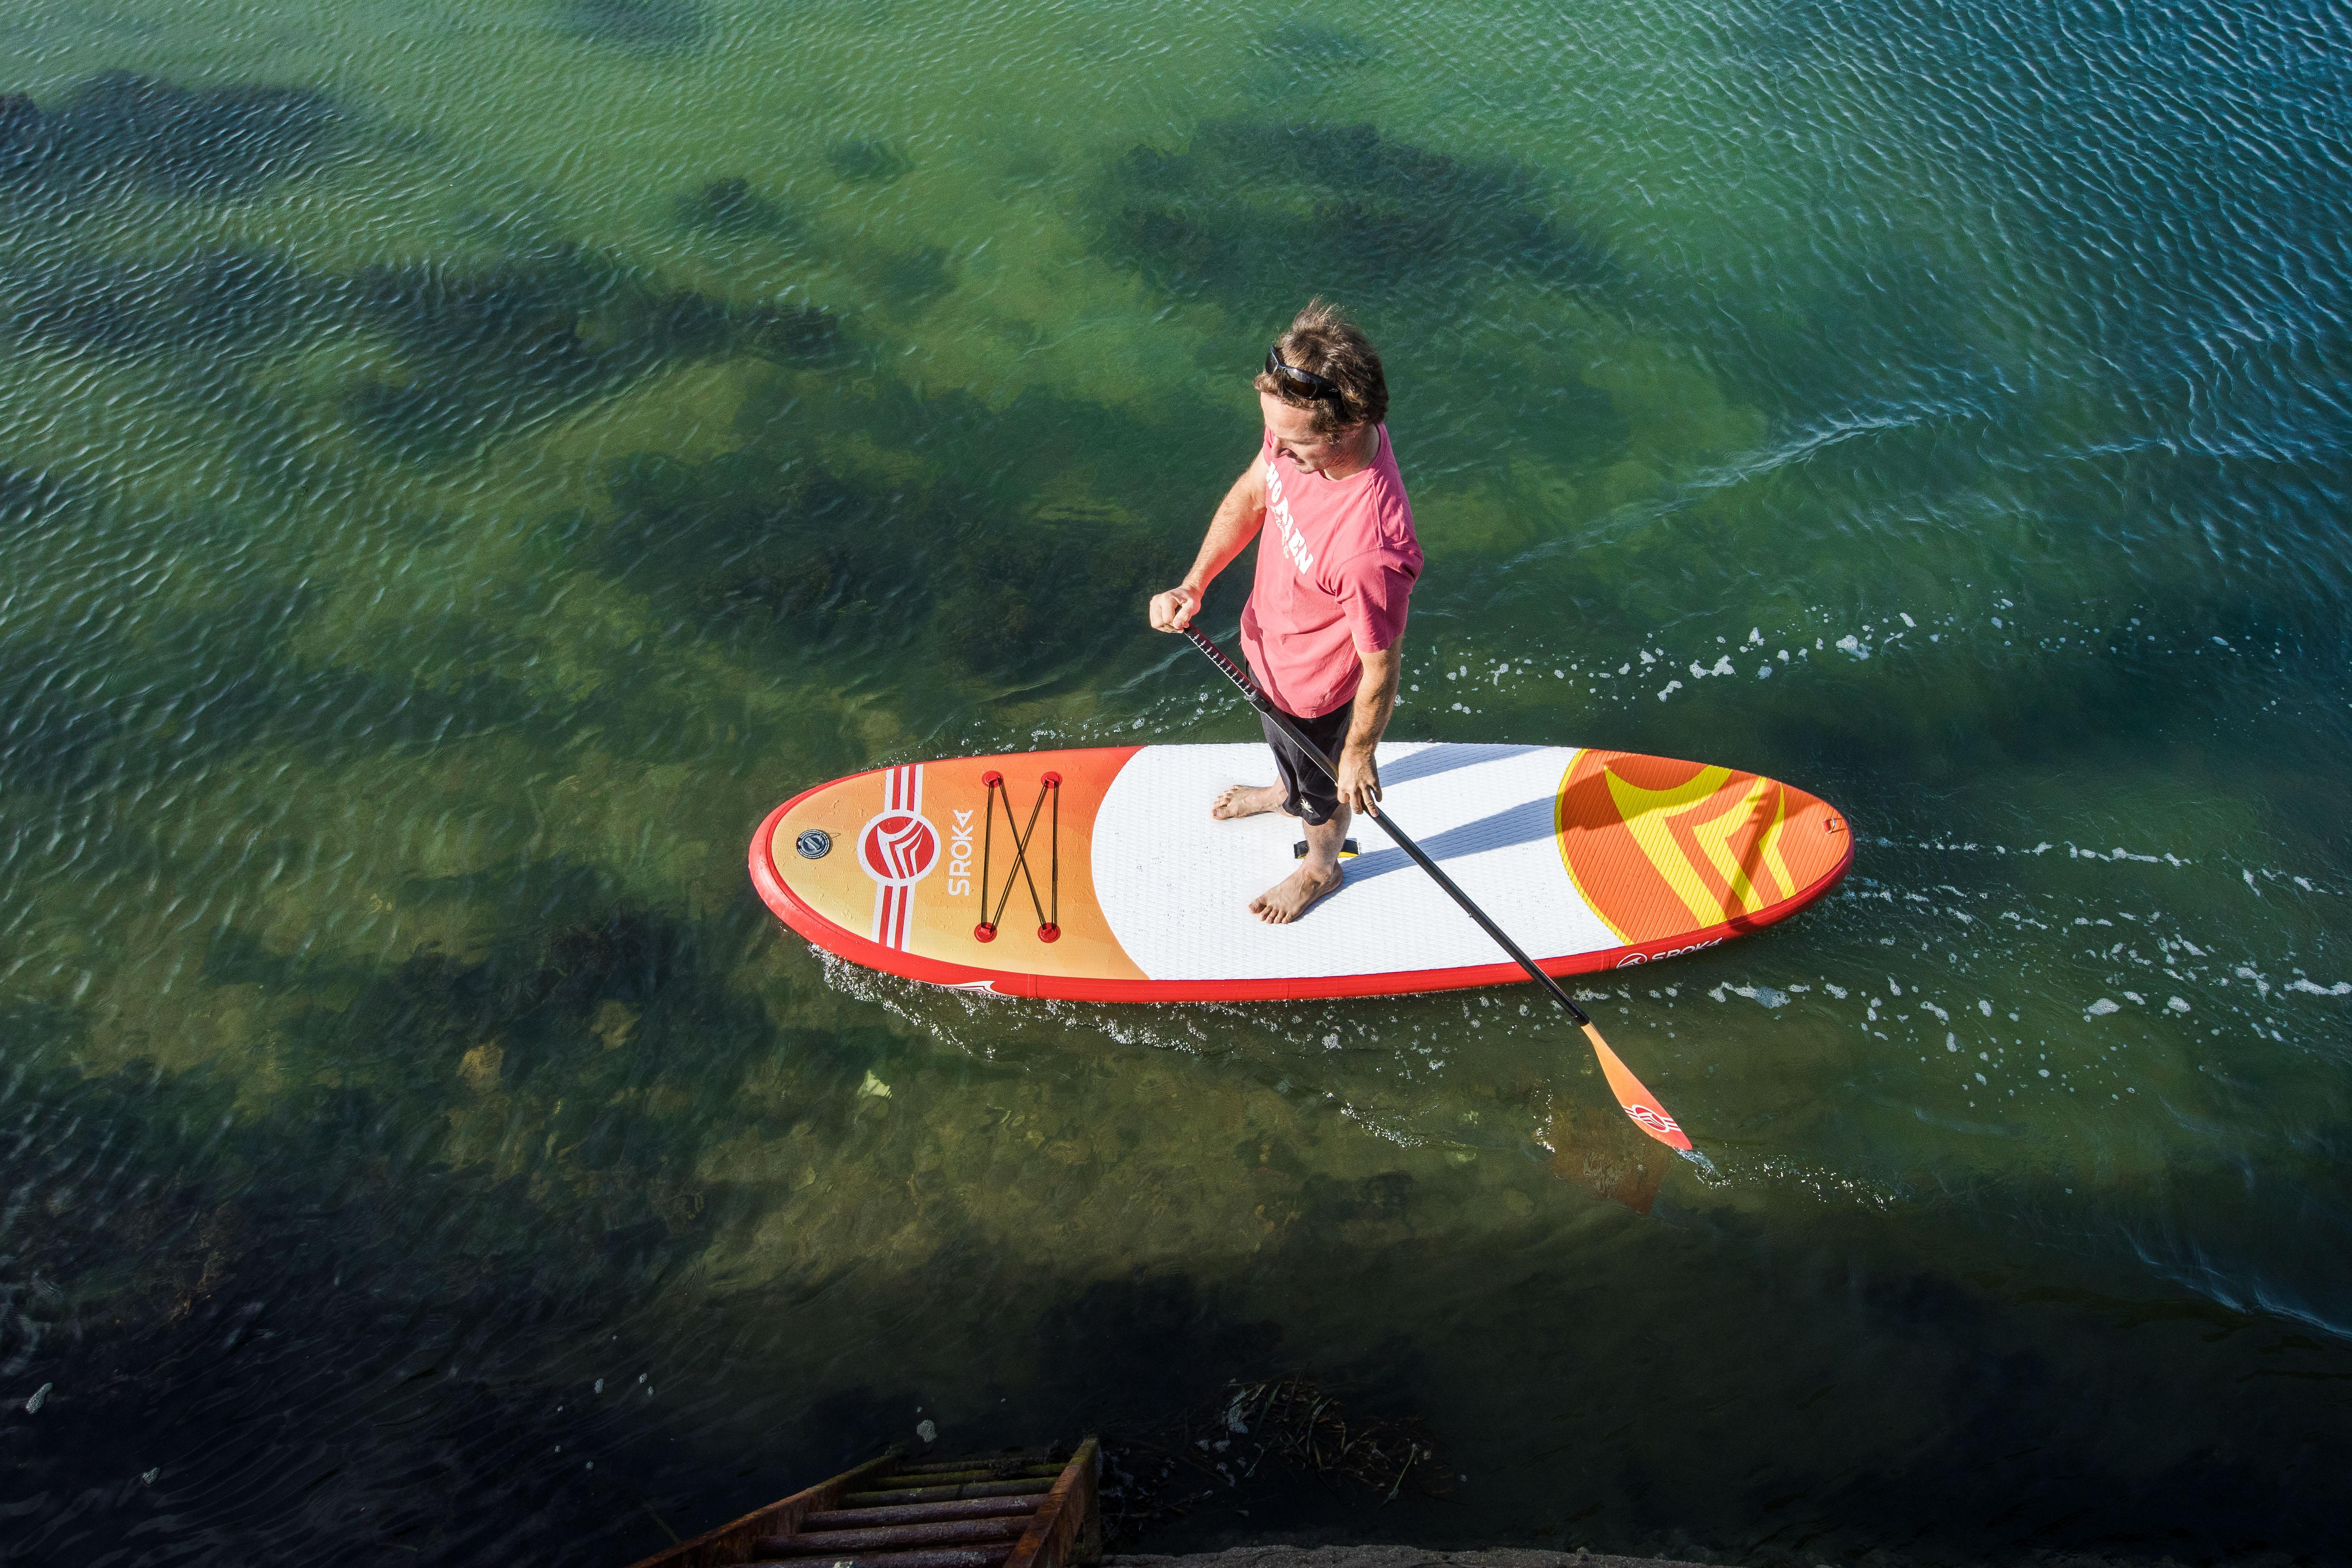 paddle sroka 10'6